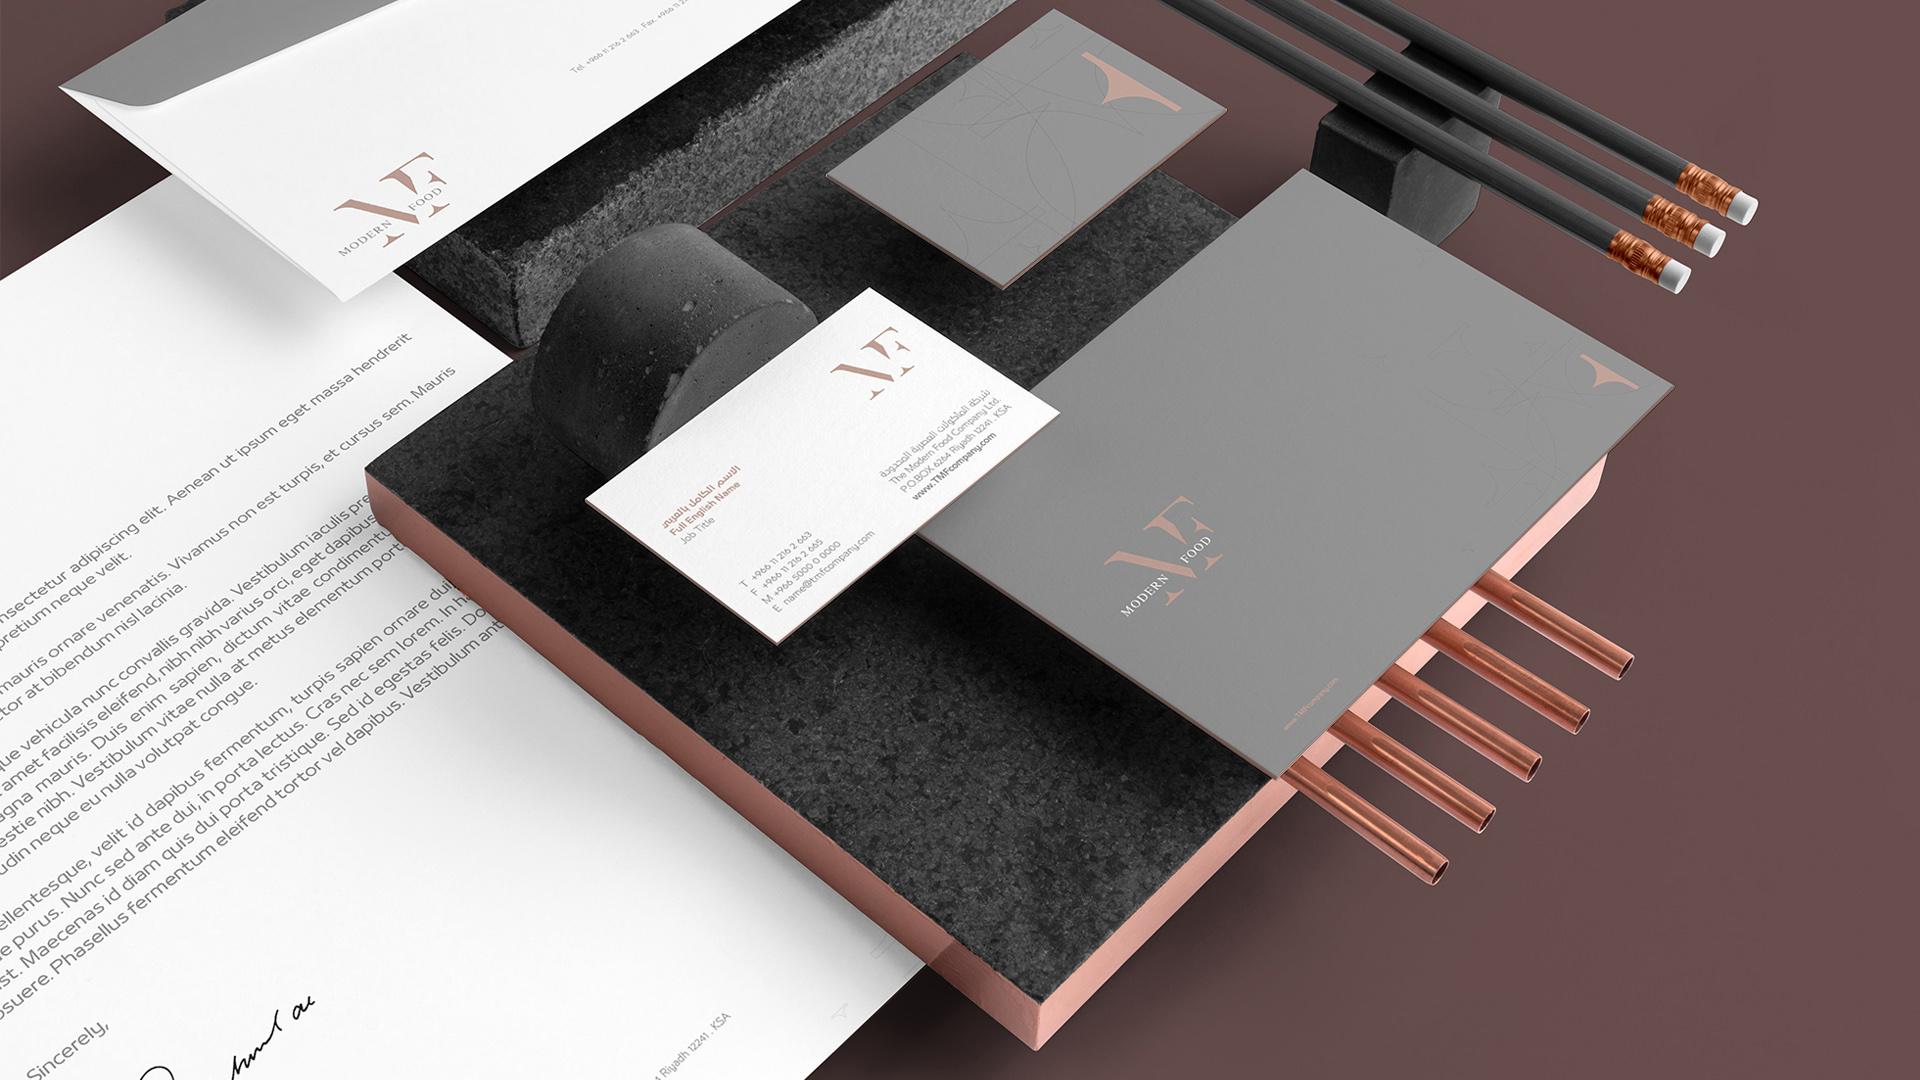 03-ModernFood_By_Storm_Design_Studio-1